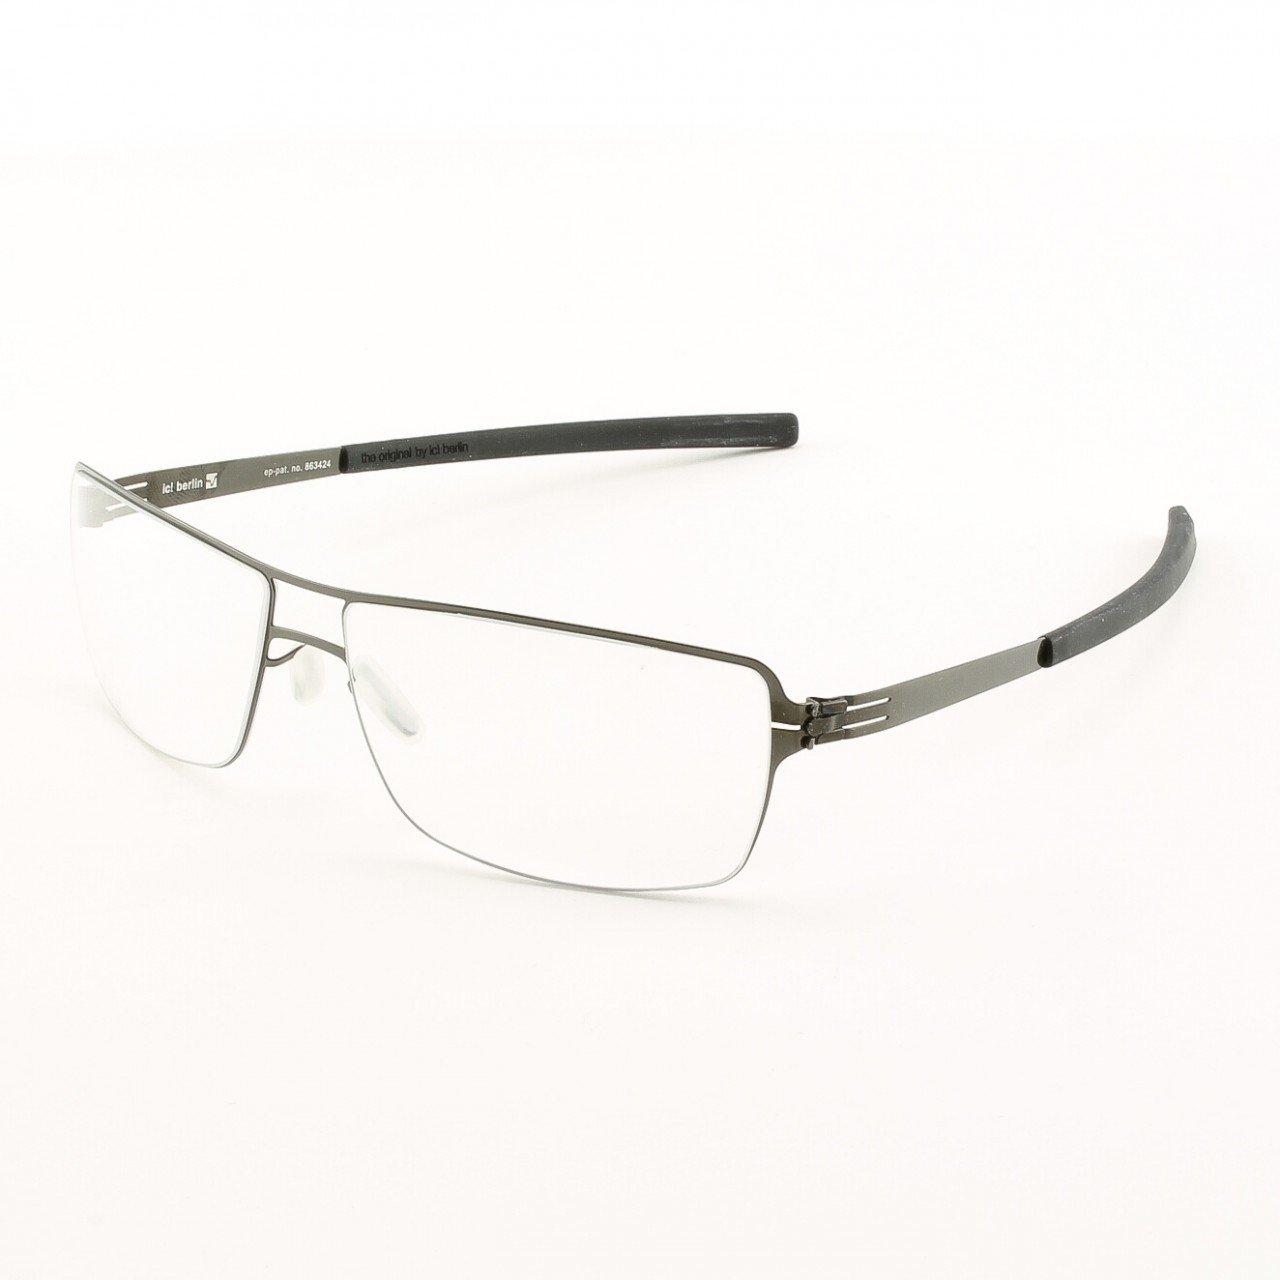 ic! Berlin Duke Eyeglasses Col. Black with Clear Lenses.